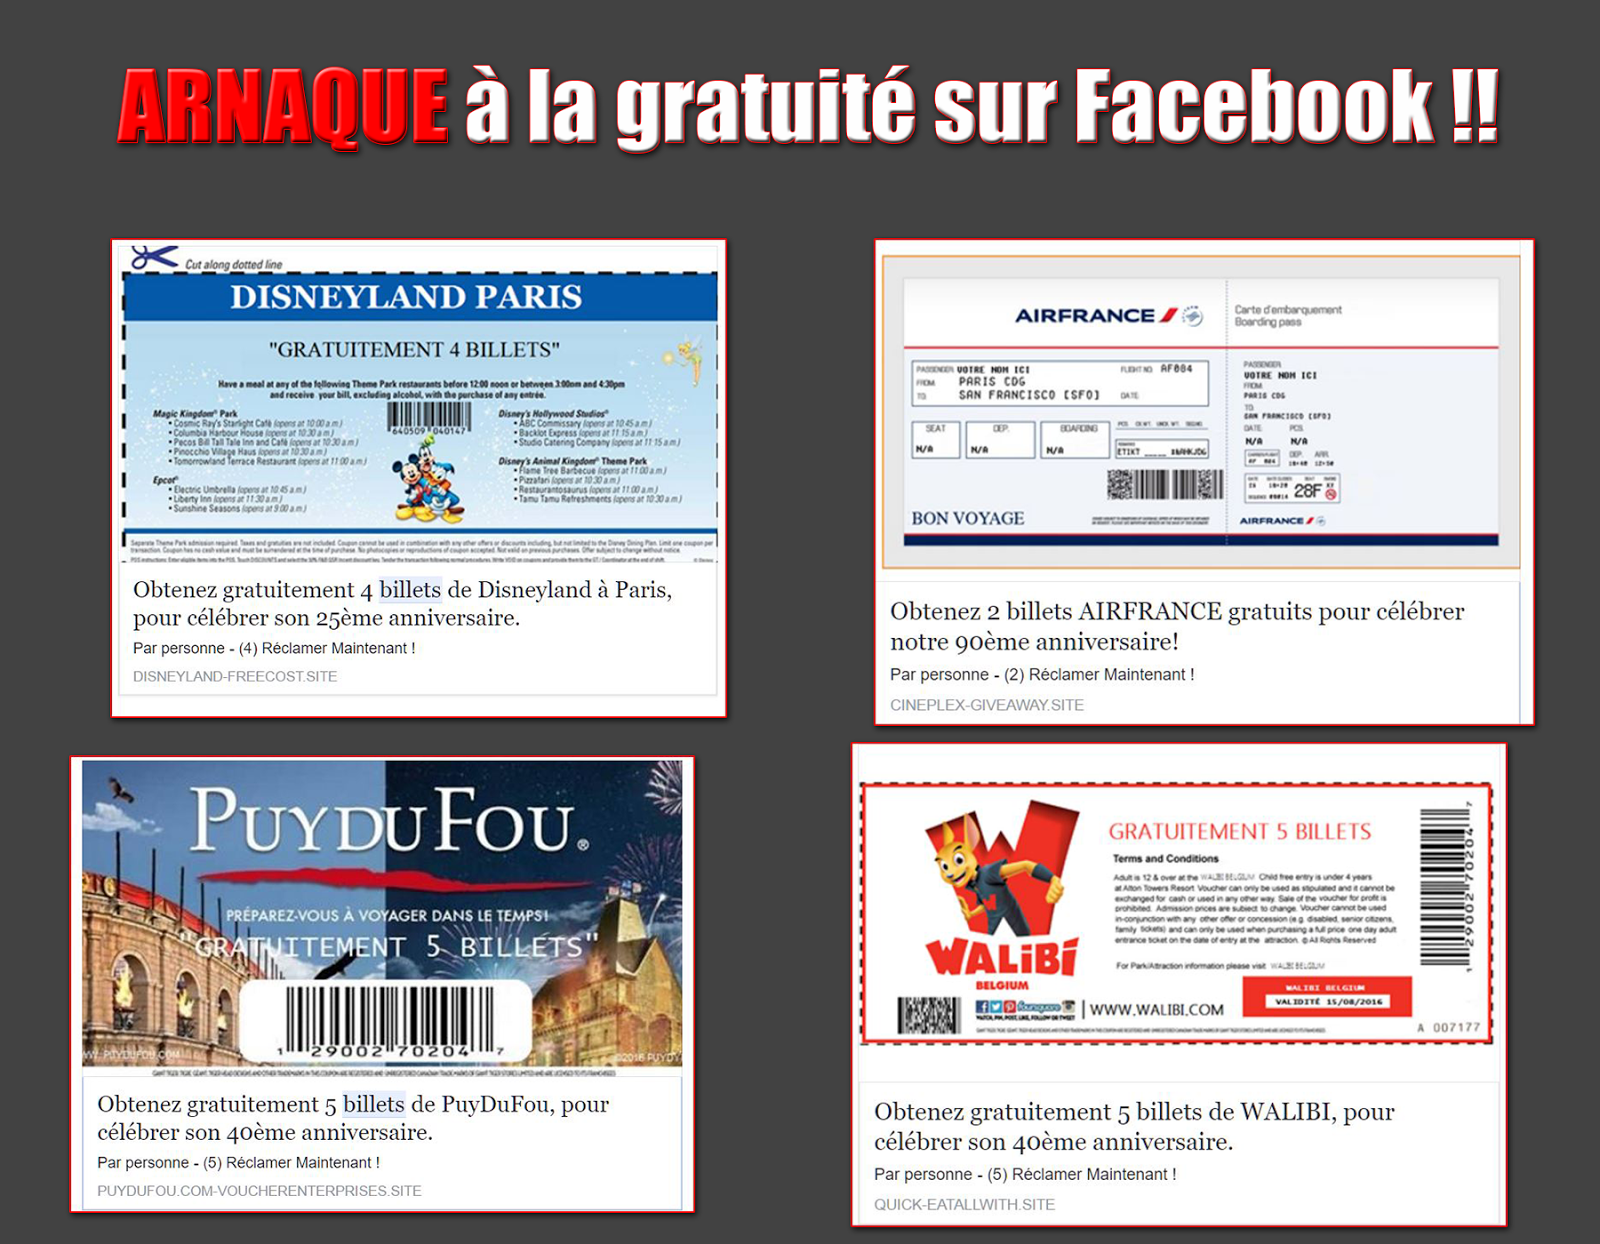 Obtenir coupons facebook